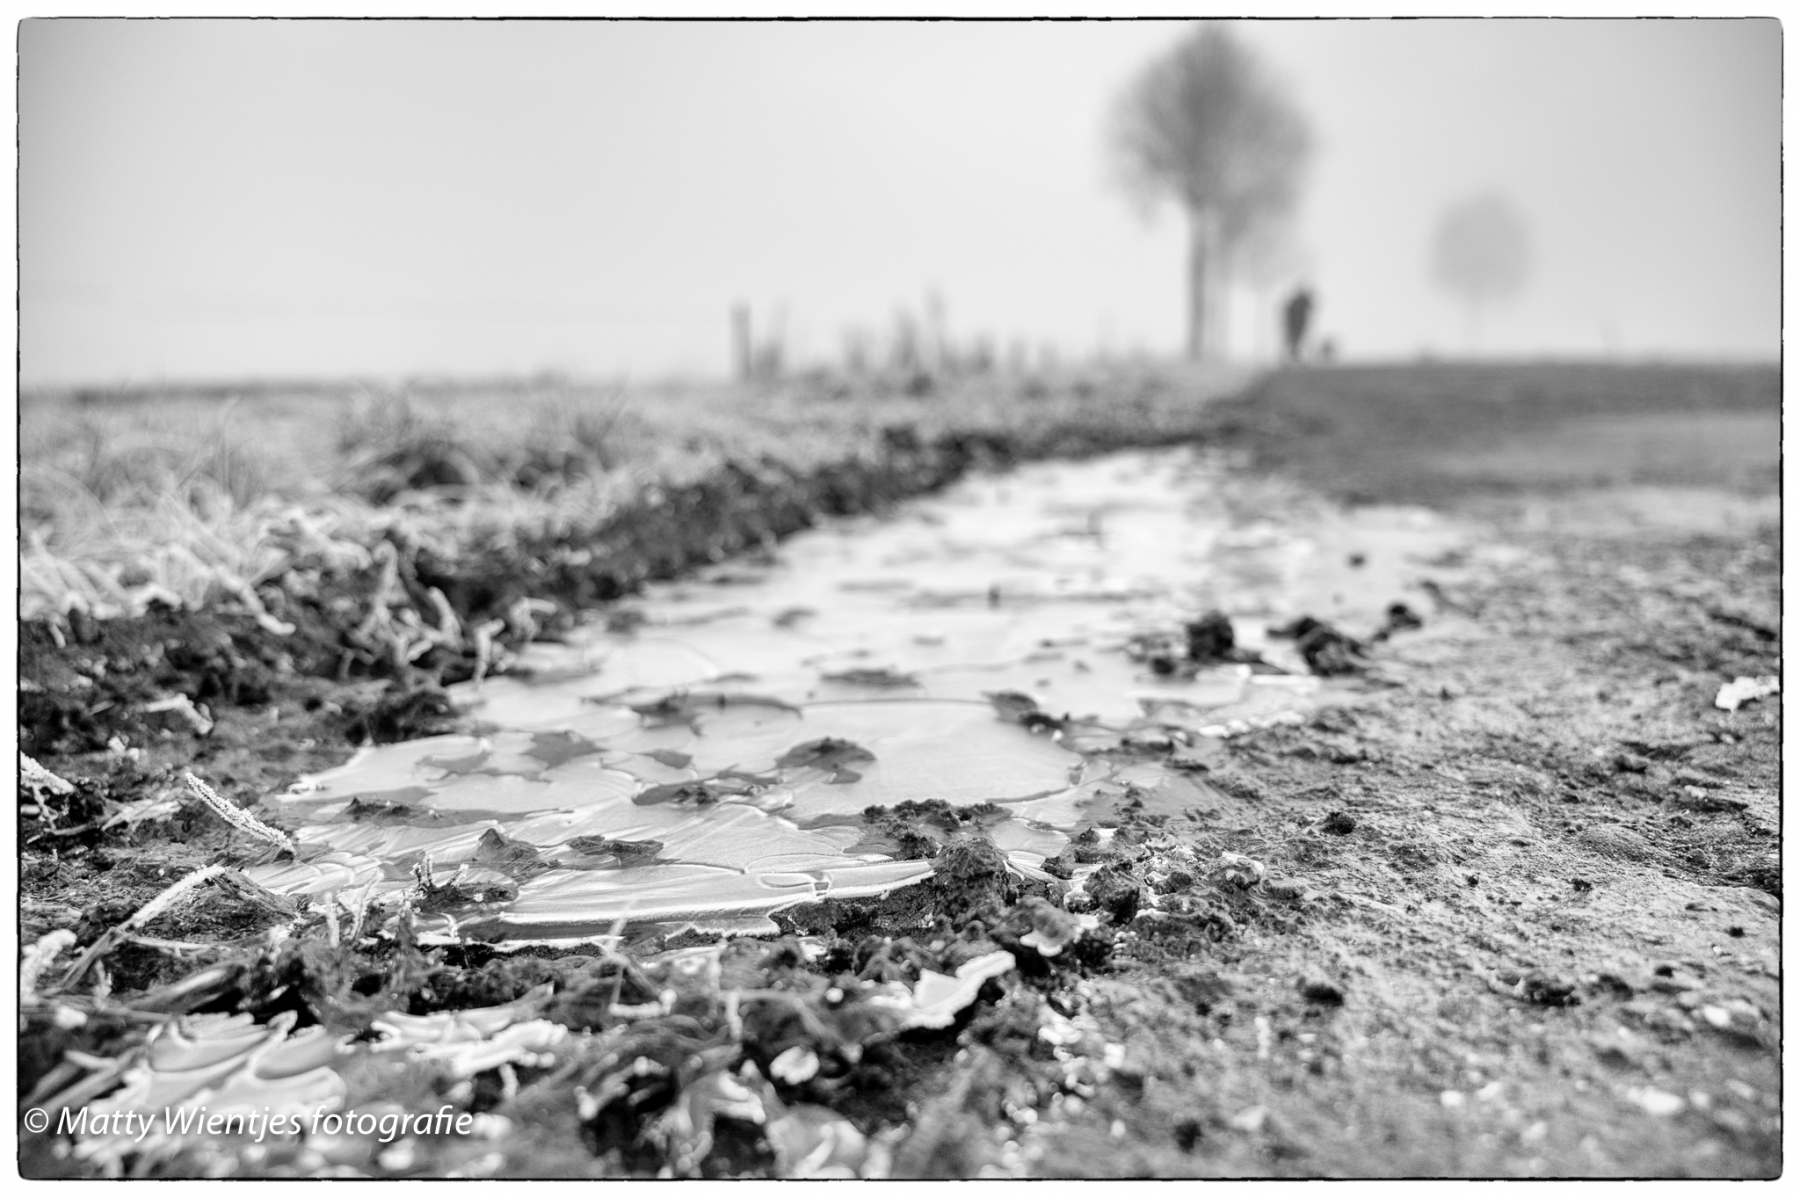 Matty Wientjes - Winter - 01